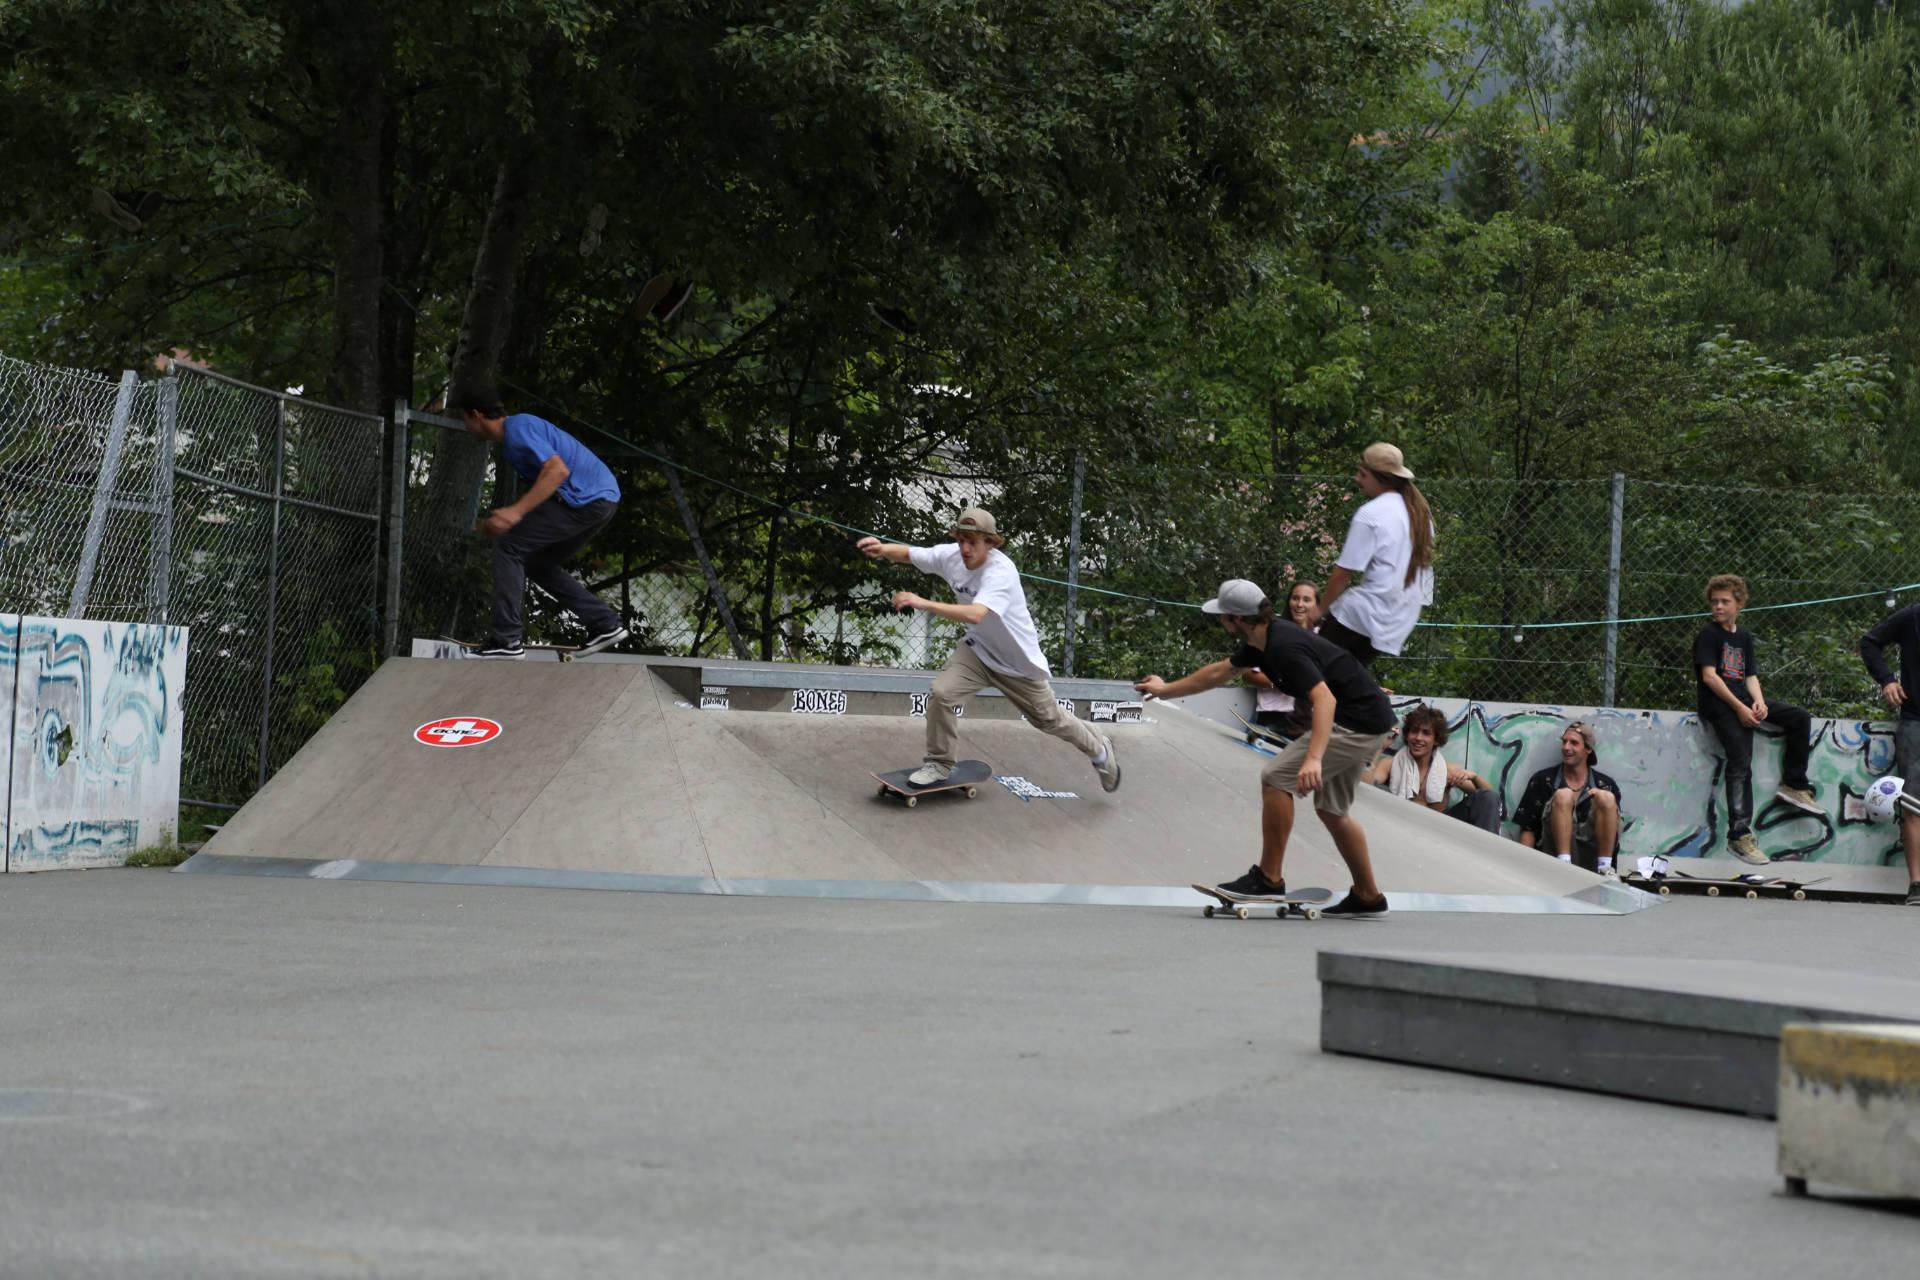 skateboardheadz fieberbrunn kgt 2019 finale 00128